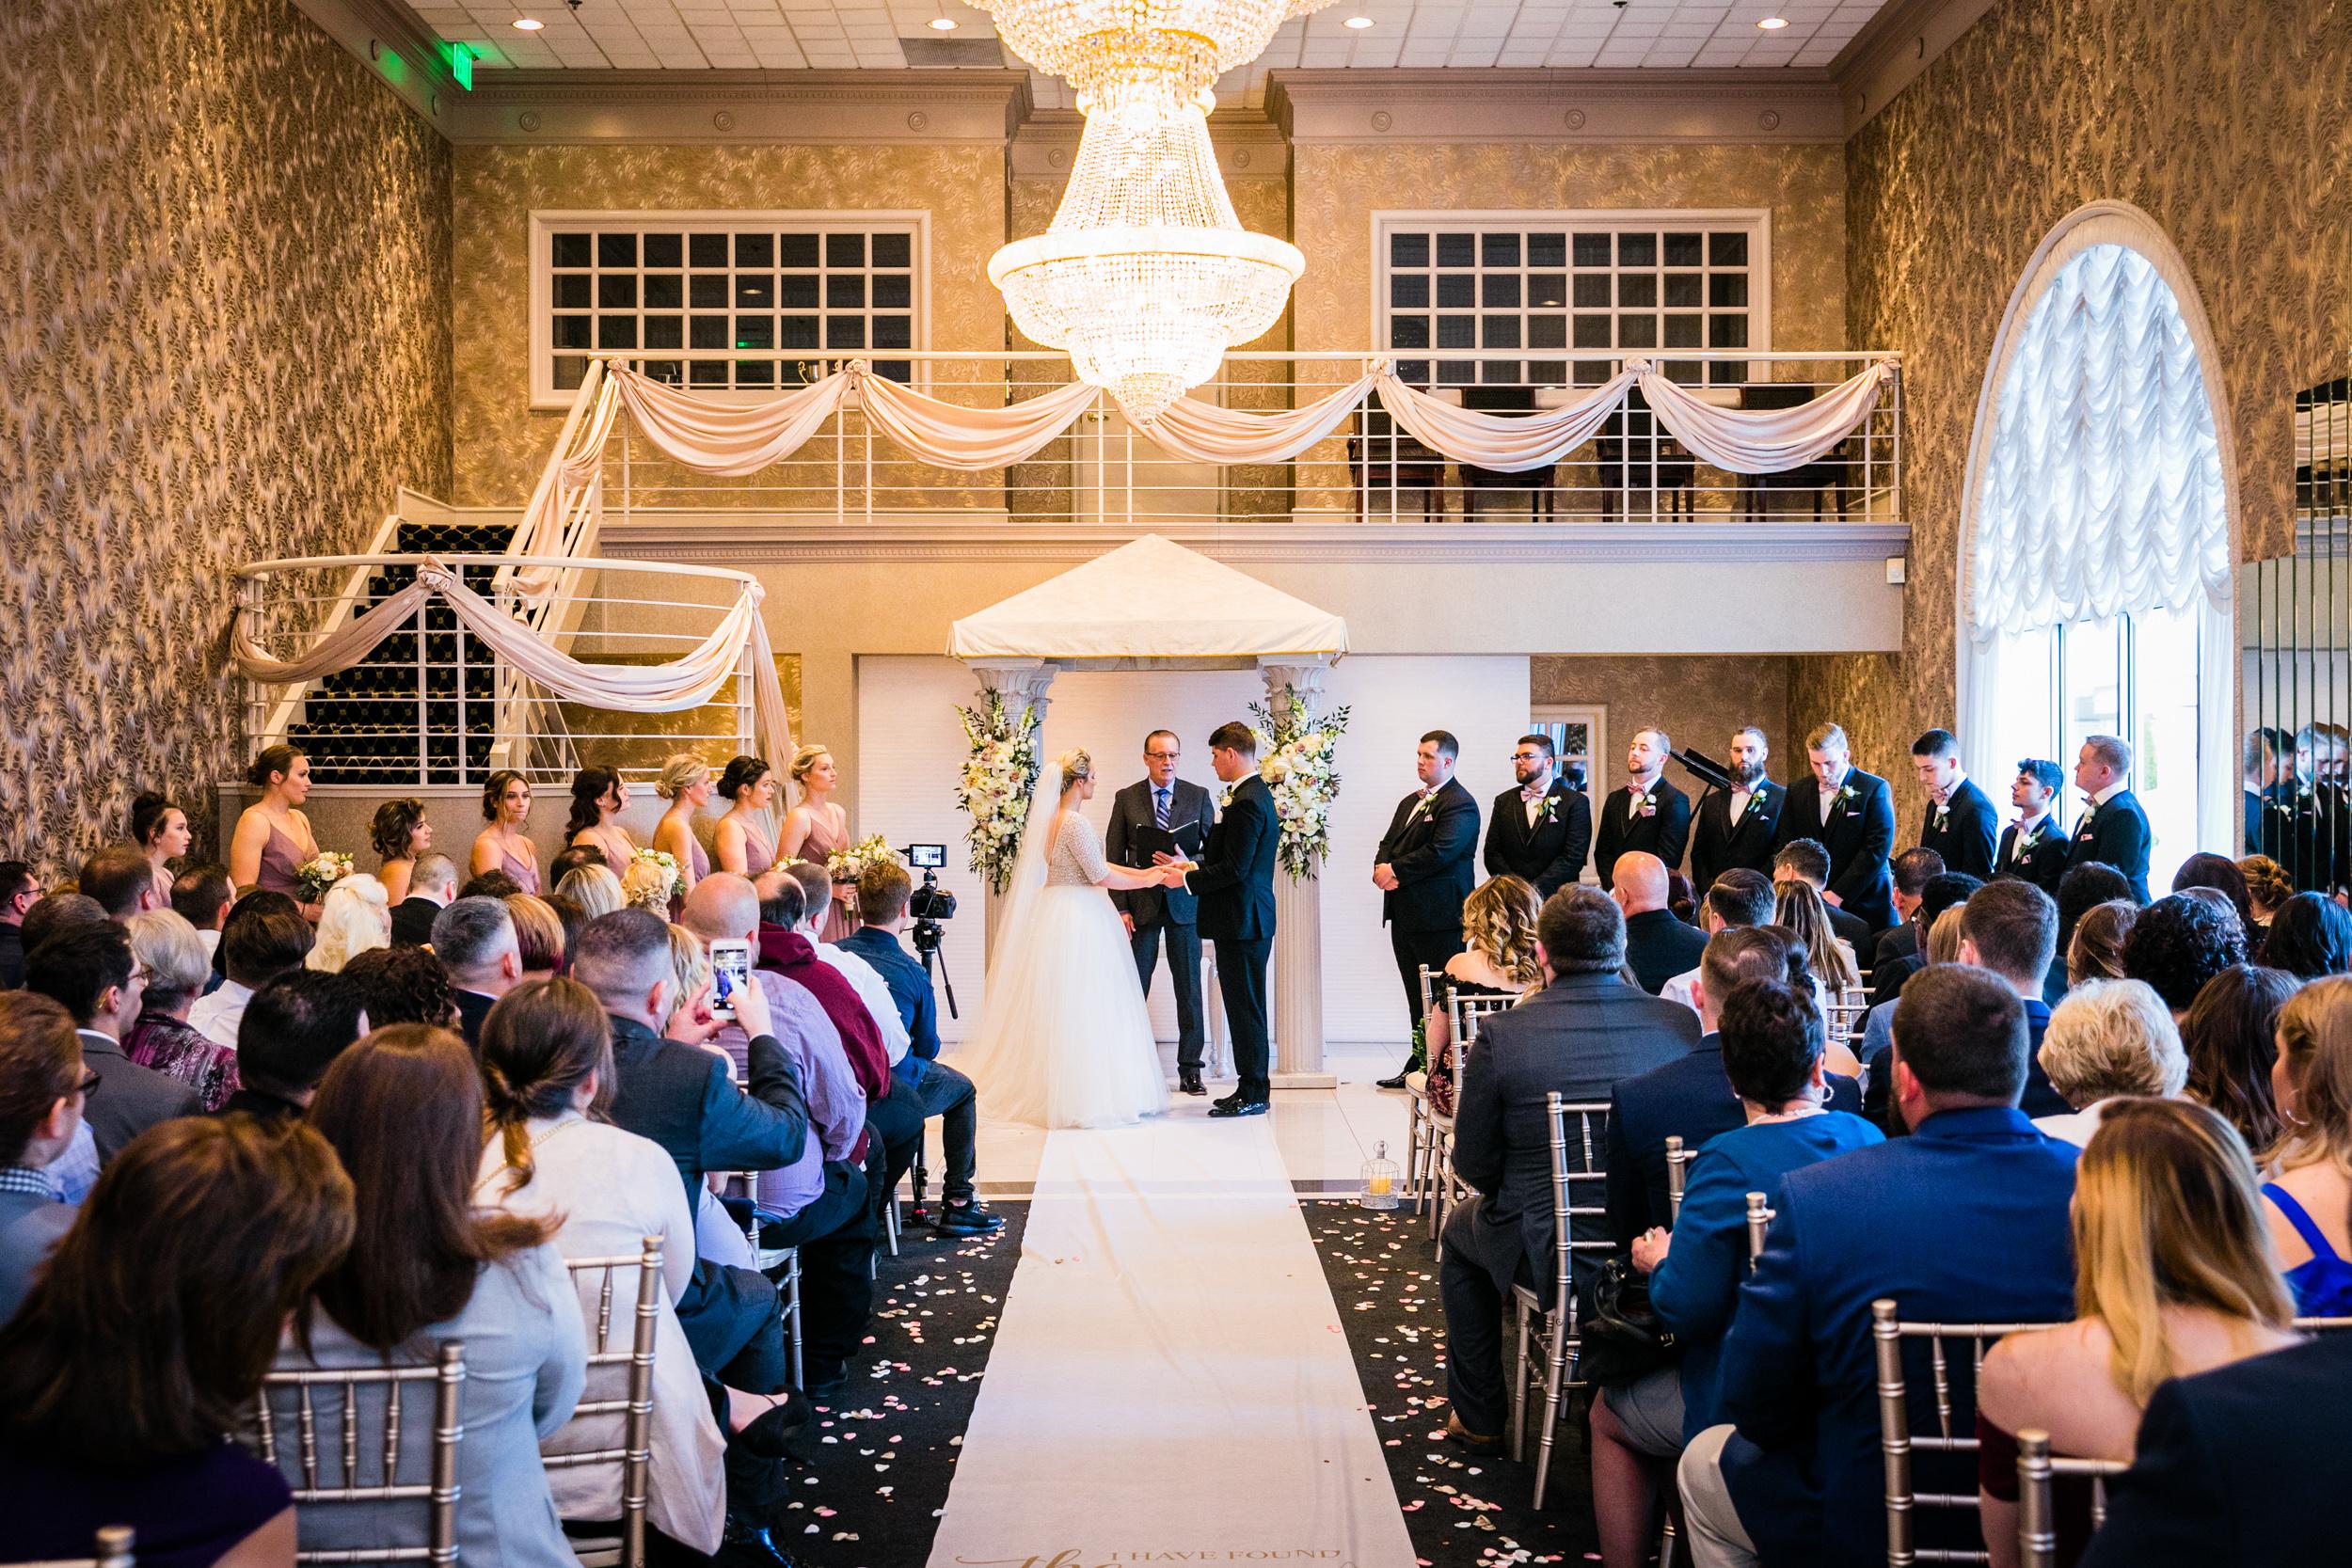 CELEBRATIONS BENSALEM WEDDING PHOTOGRAPHY-52.jpg